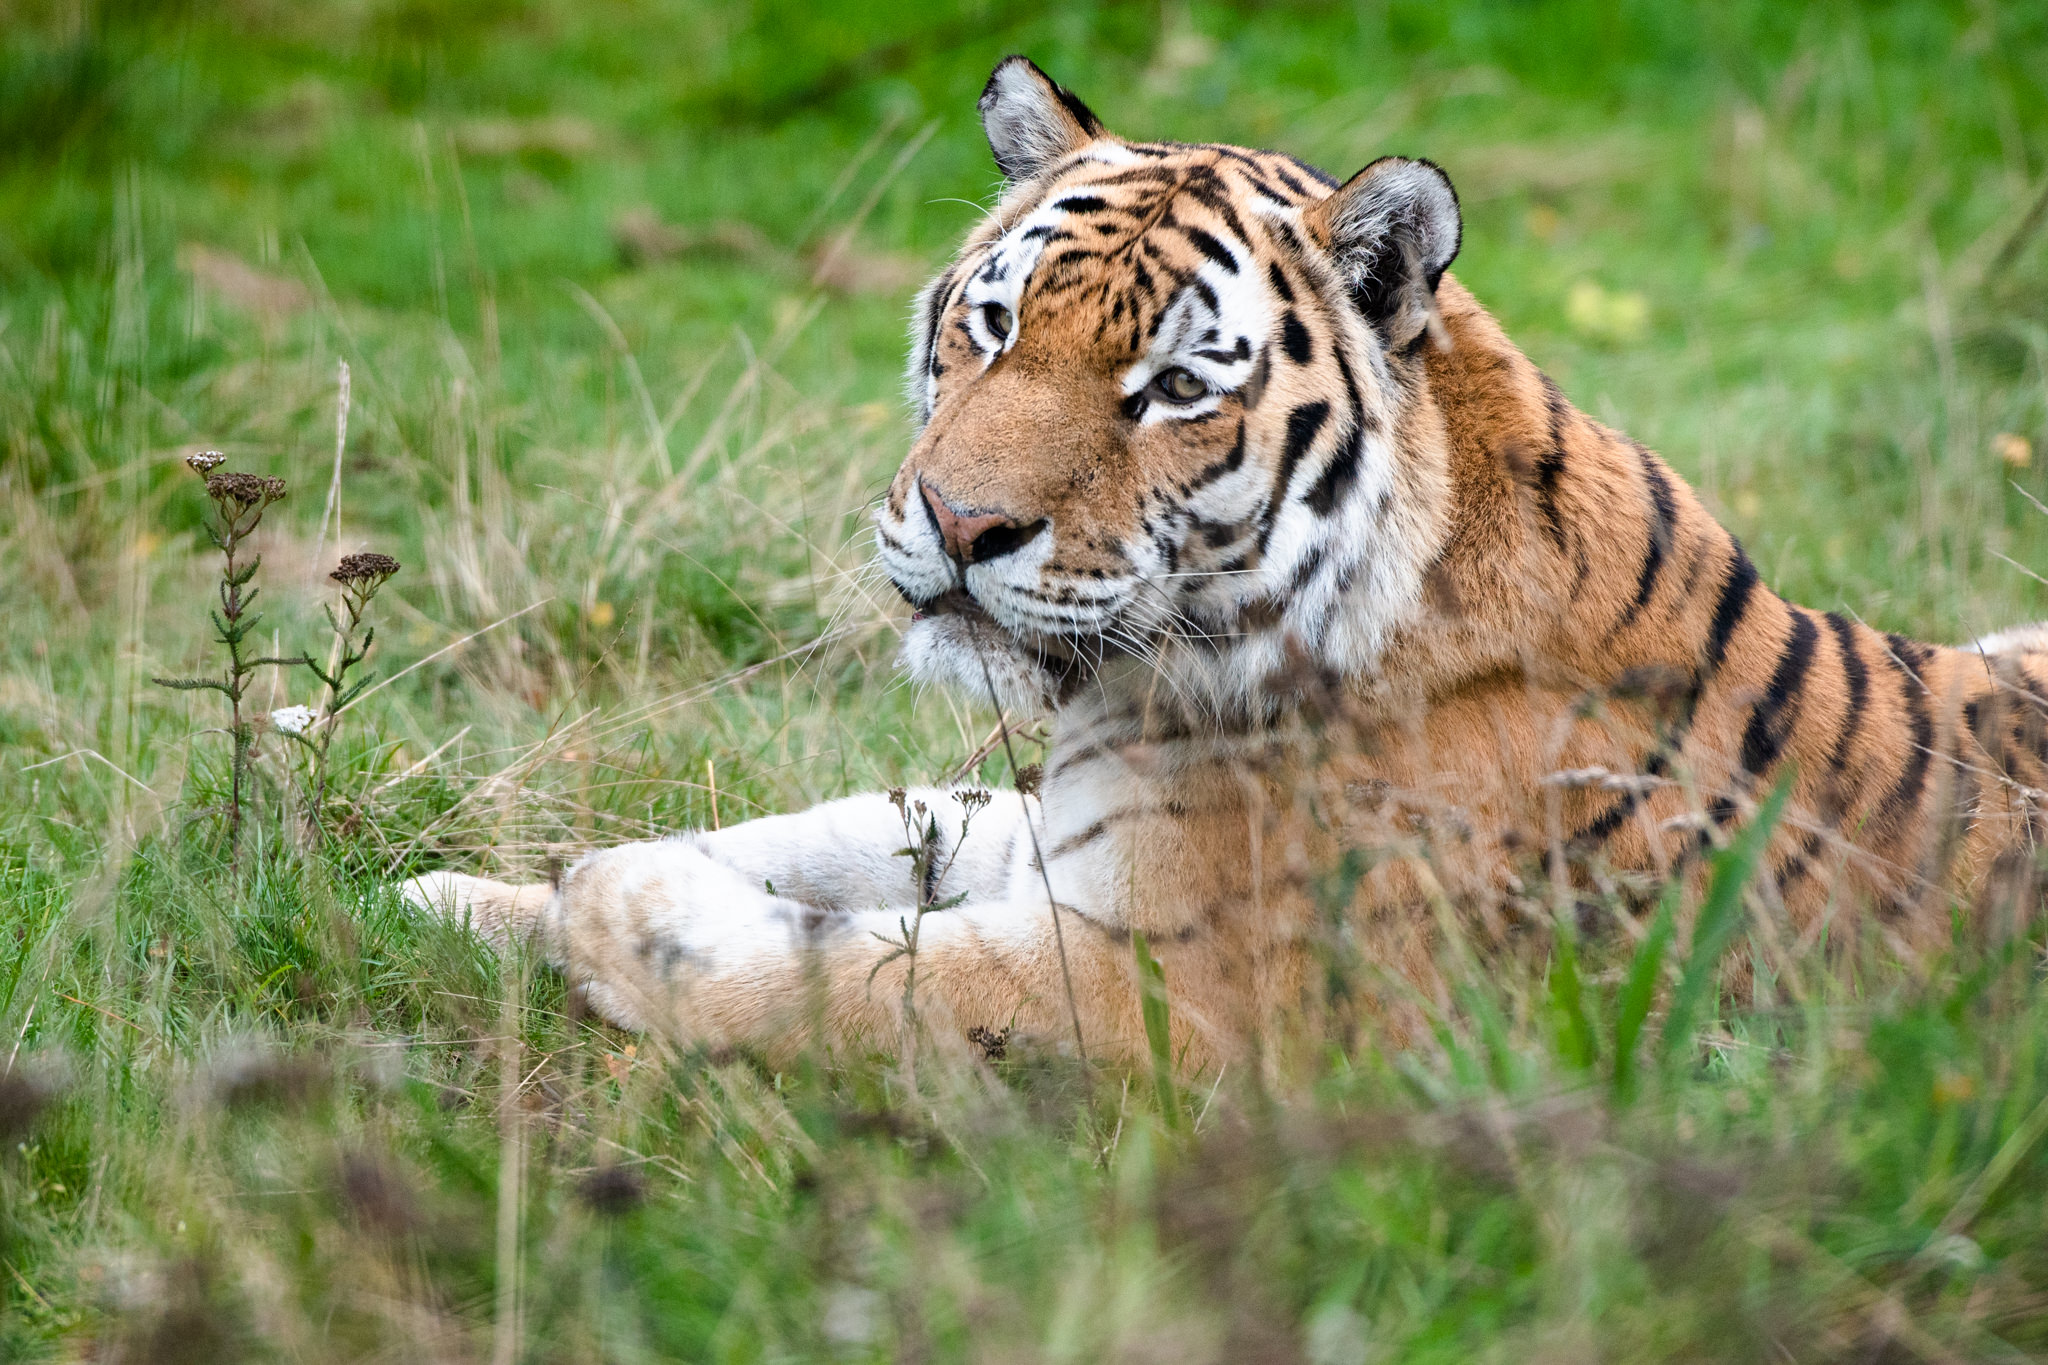 highland-wildlife-park-sitting-tiger-marty-3174-small.jpg